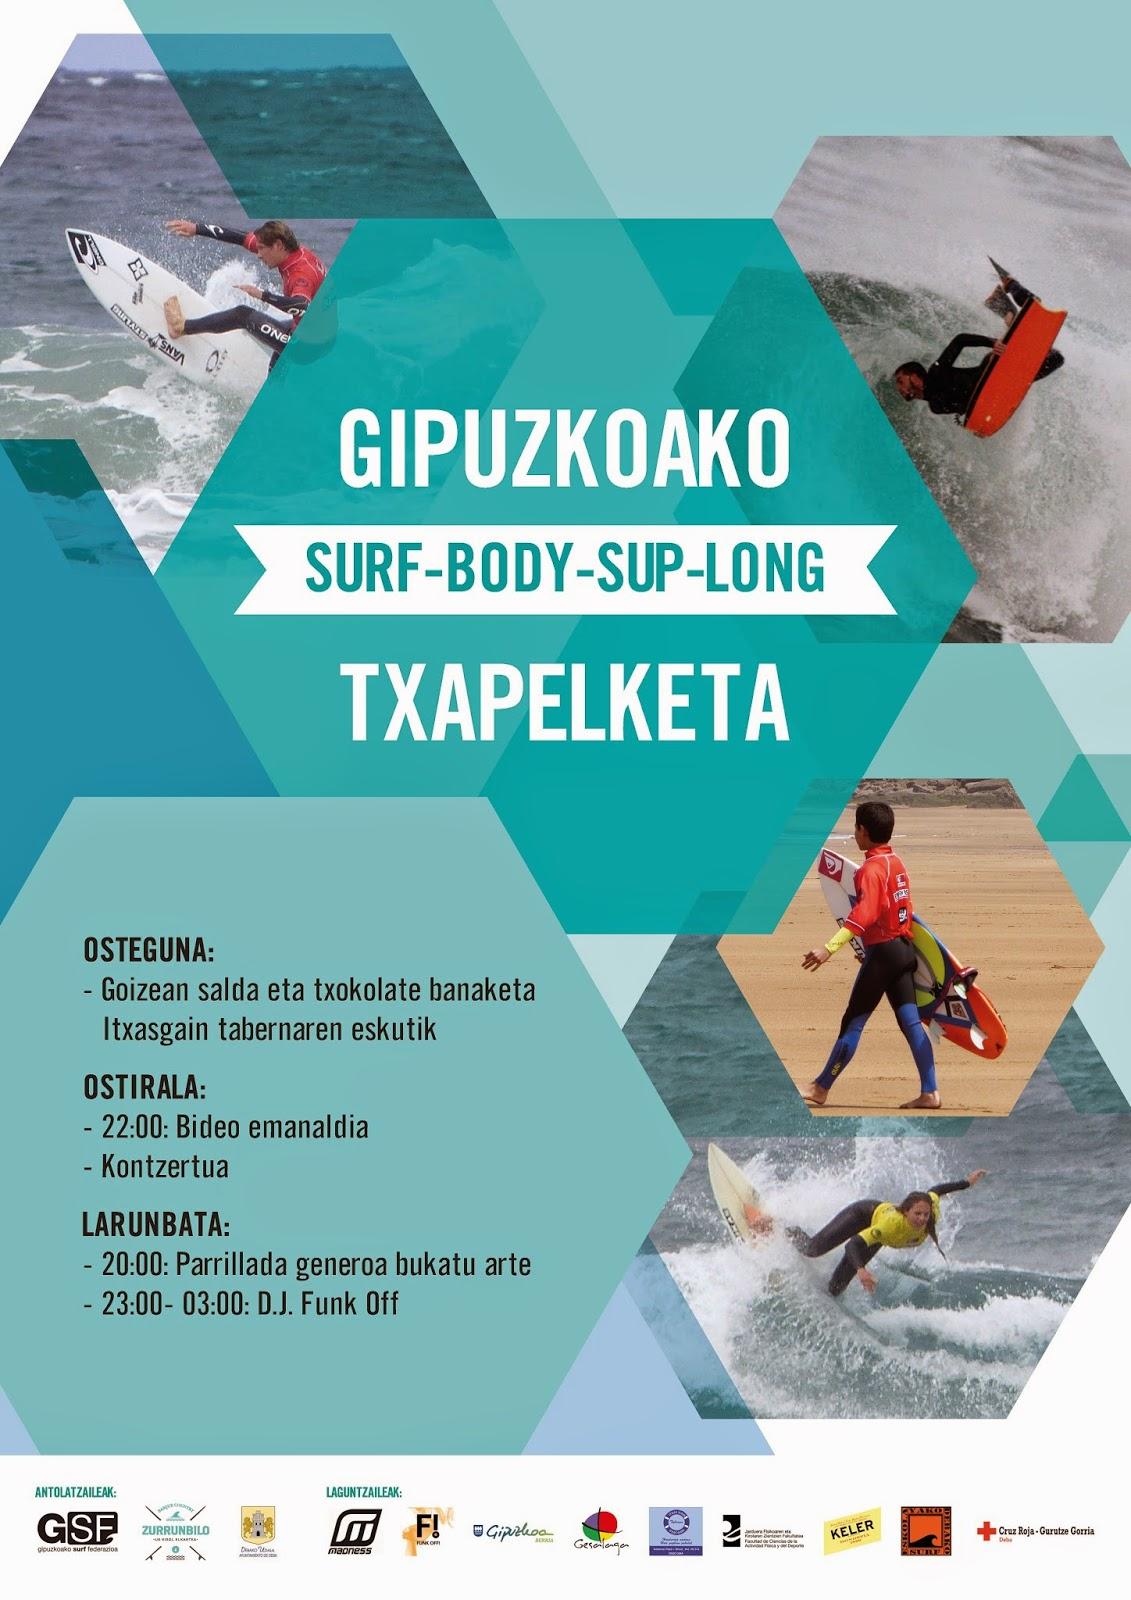 campeonato gipuzkoa surf 2015 02